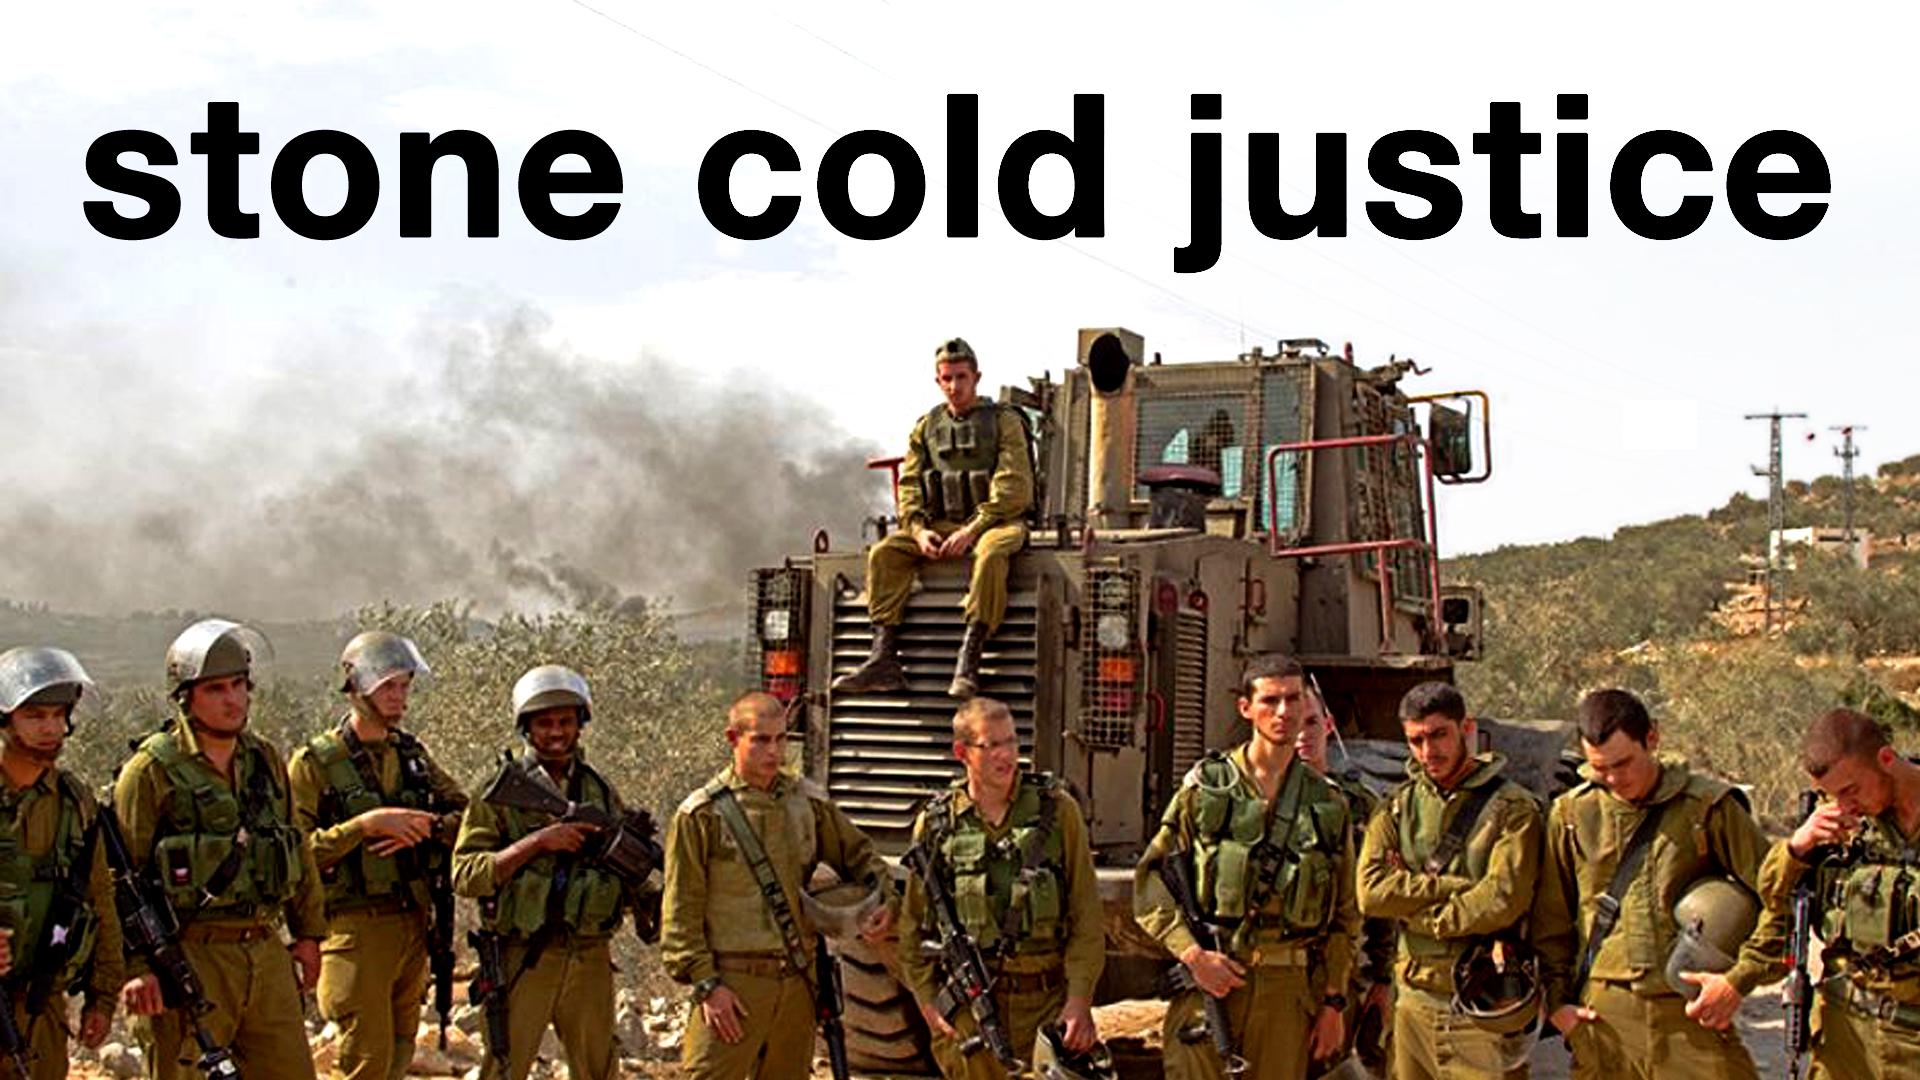 Stone Cold Justice